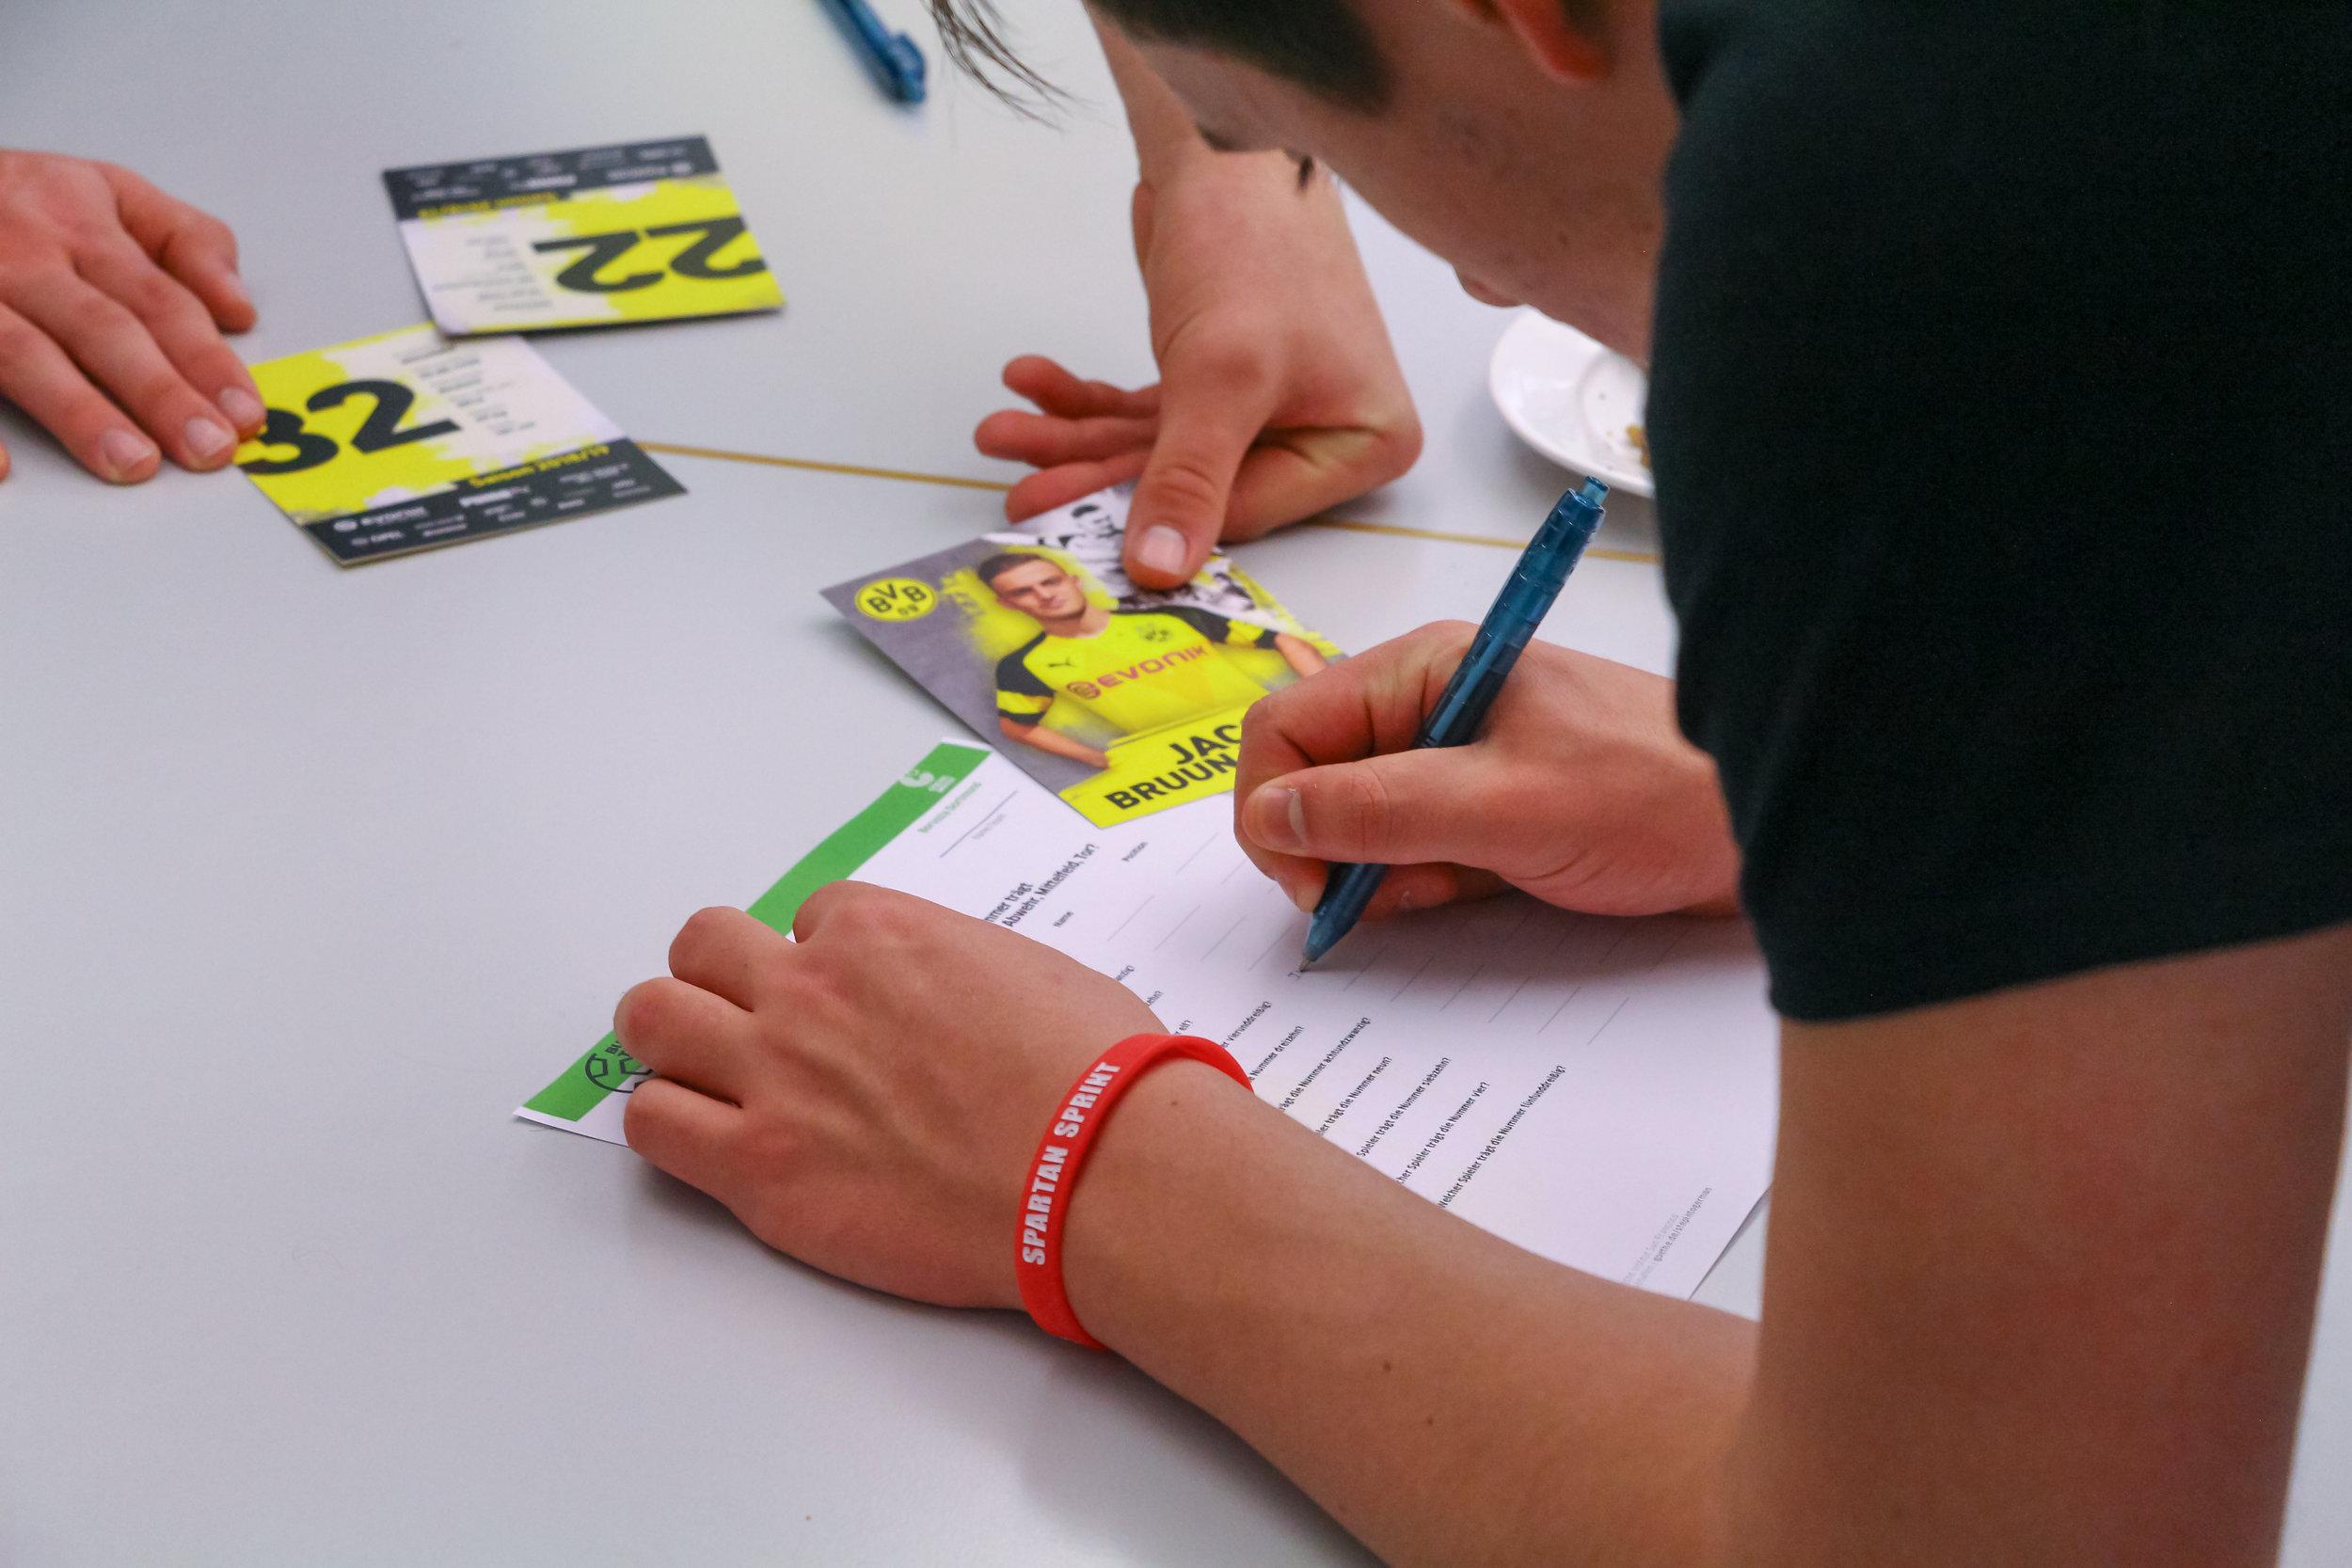 Students compete in  Bundesliga Total . Goethe-Institut, Chicago, 2019.